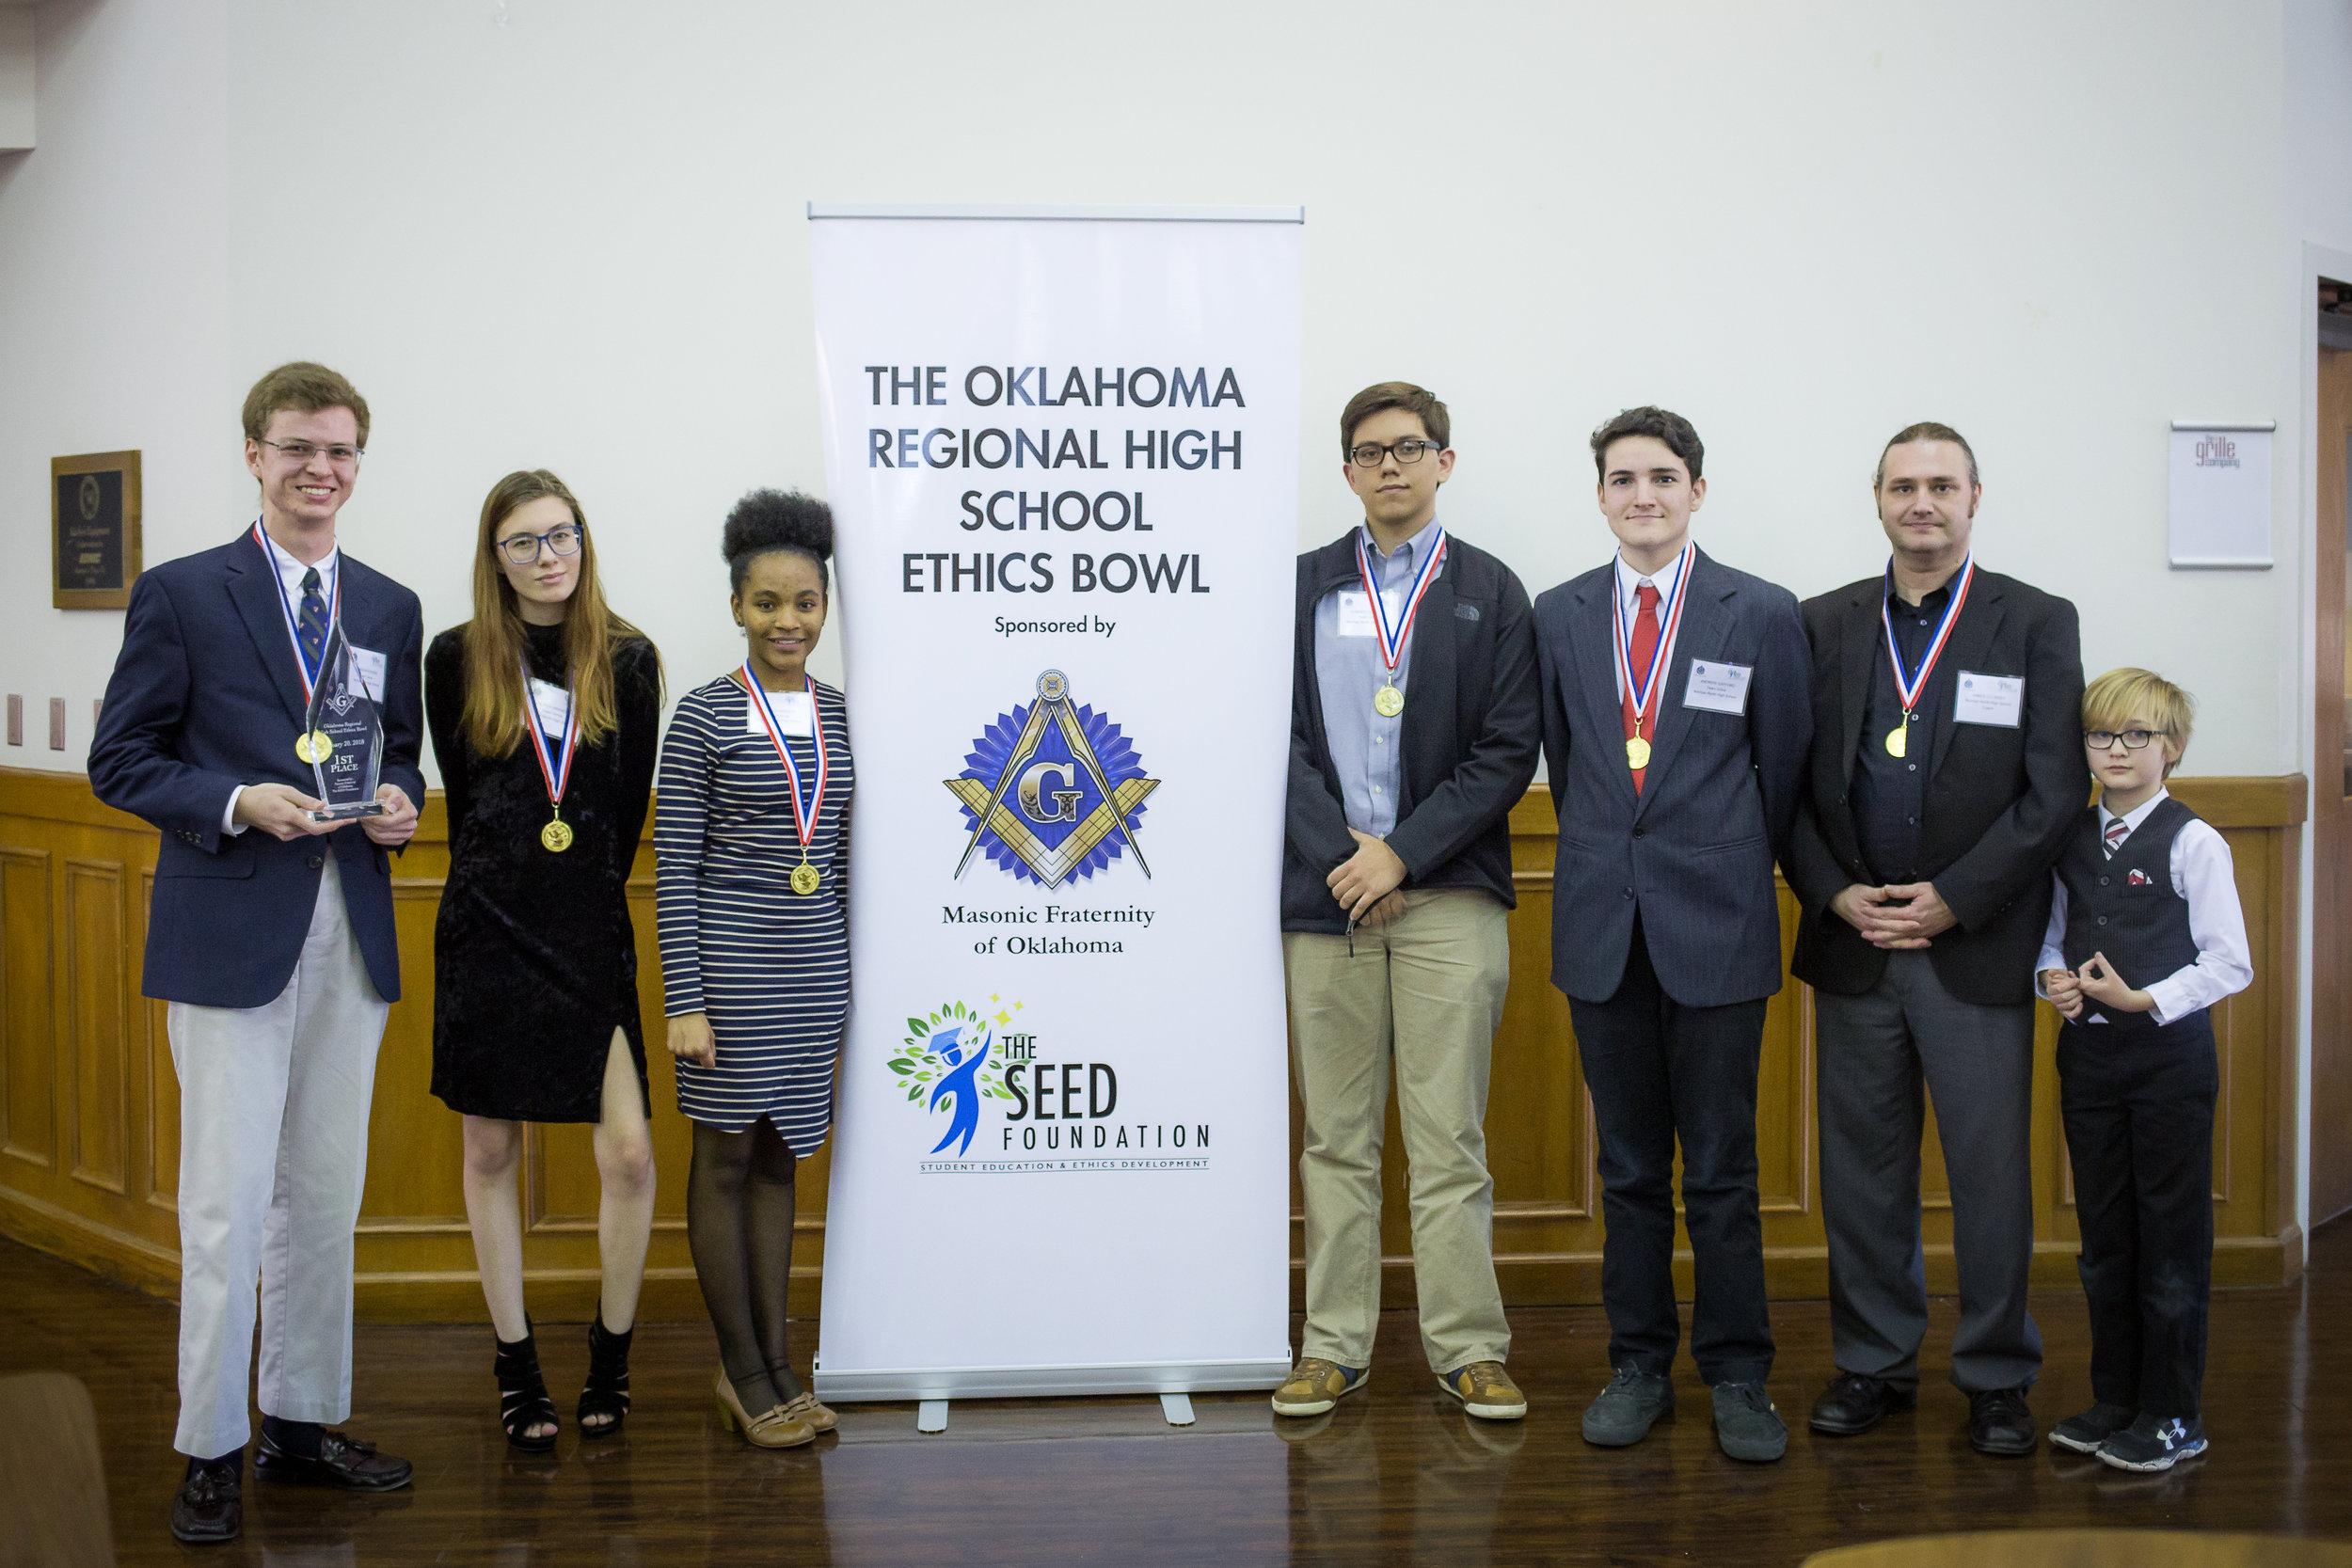 2018 2nd Annual Oklahoma Region High School Ethics Bowl Winner Norman North High School - team Virtue